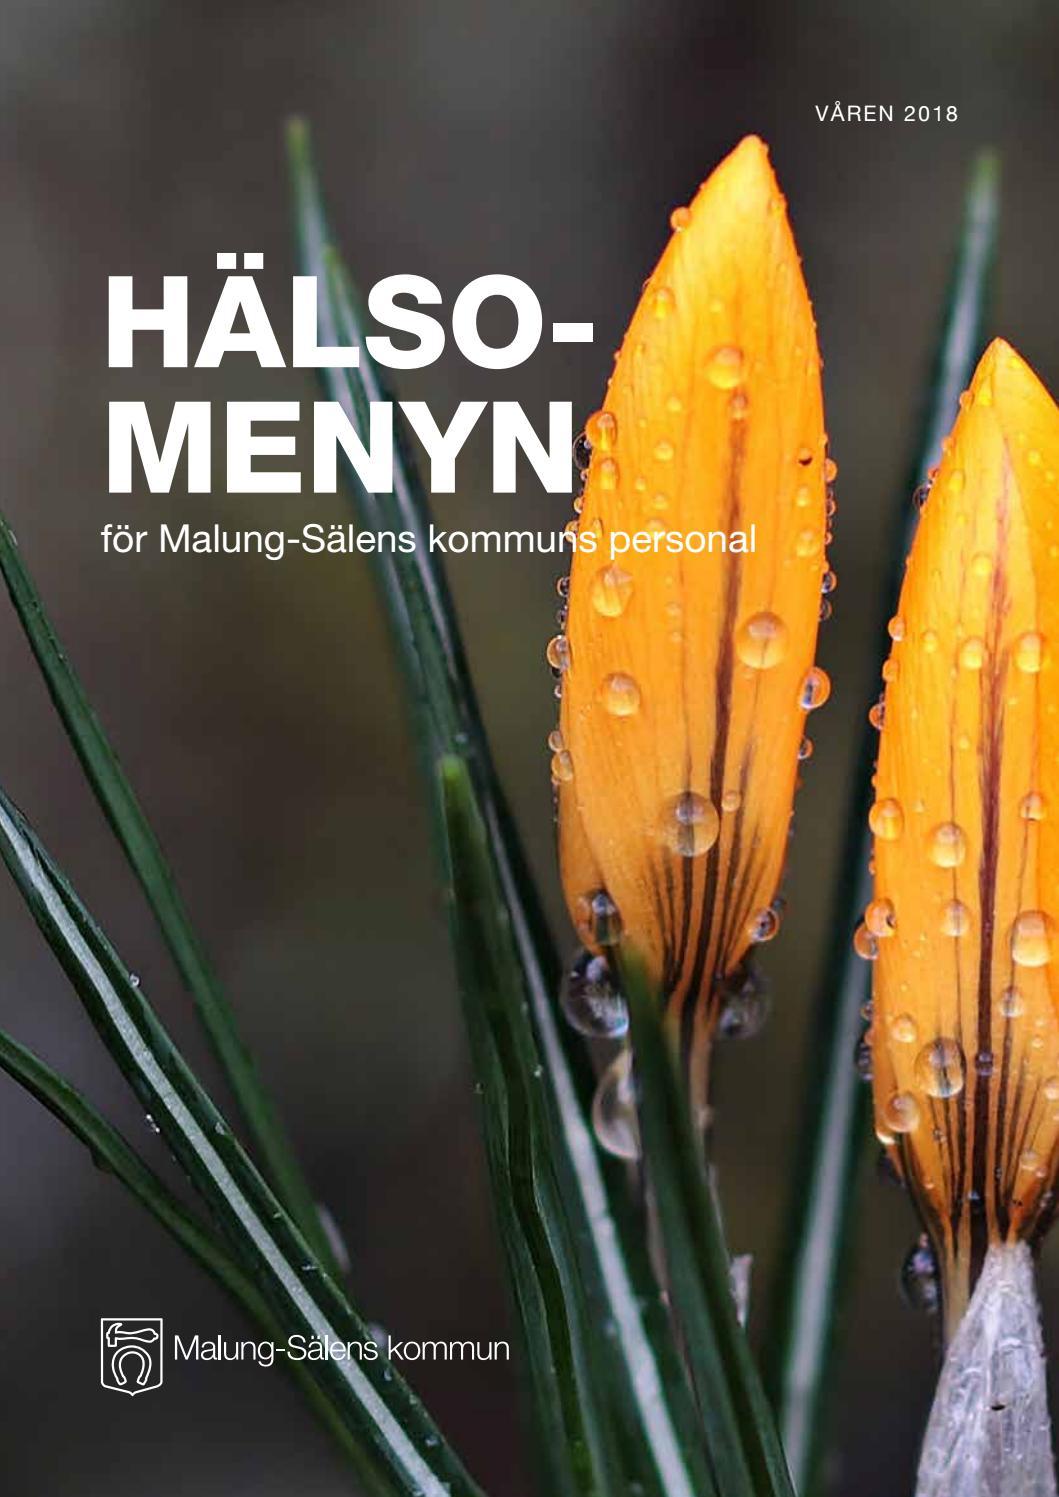 Halsomeny Varen18 By Anders Lowenberg Issuu